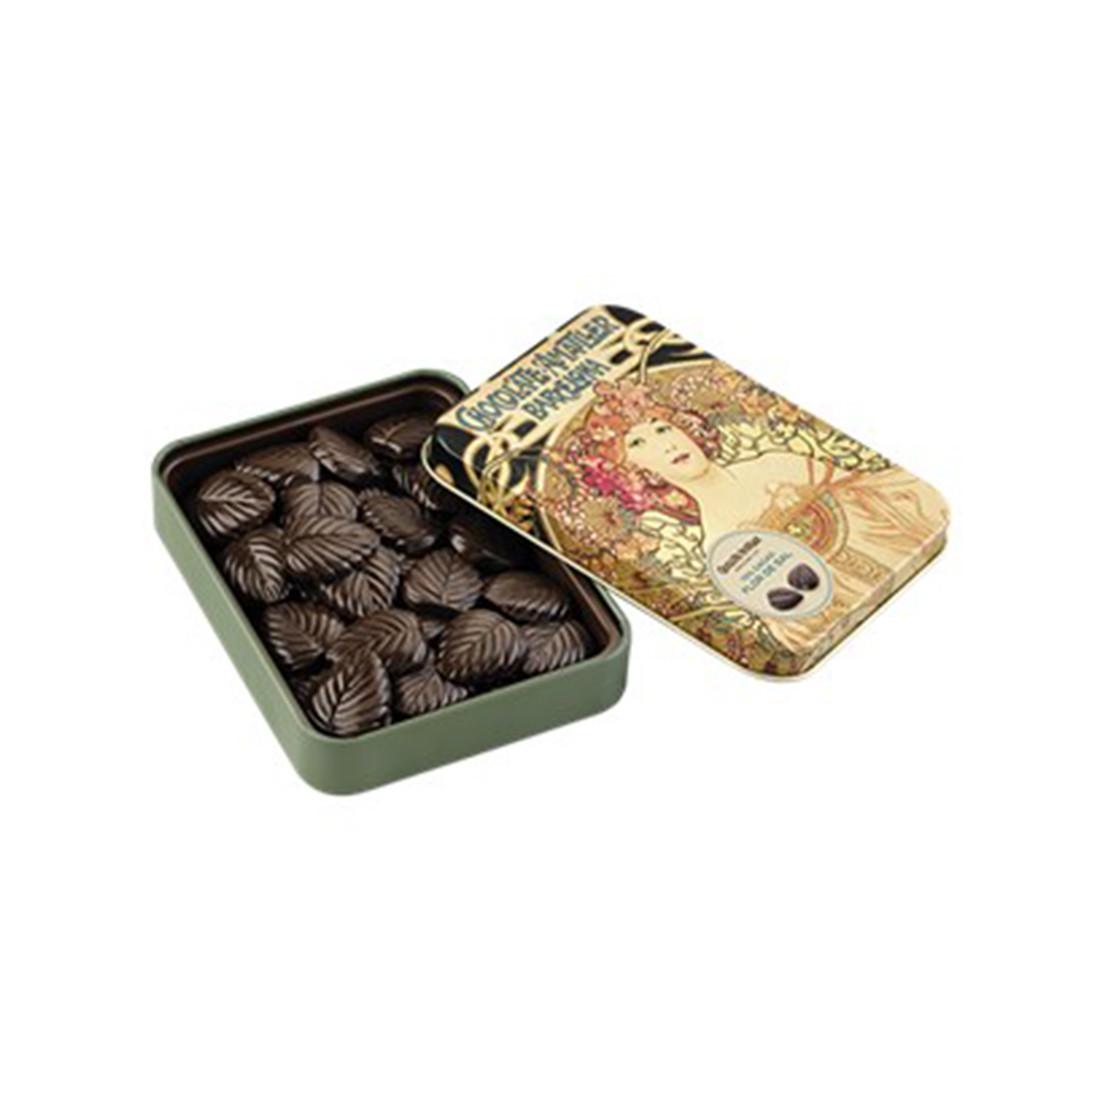 Billede af Simon Coll, 70% Mørk chokolade m salt i dåse - 60 gram